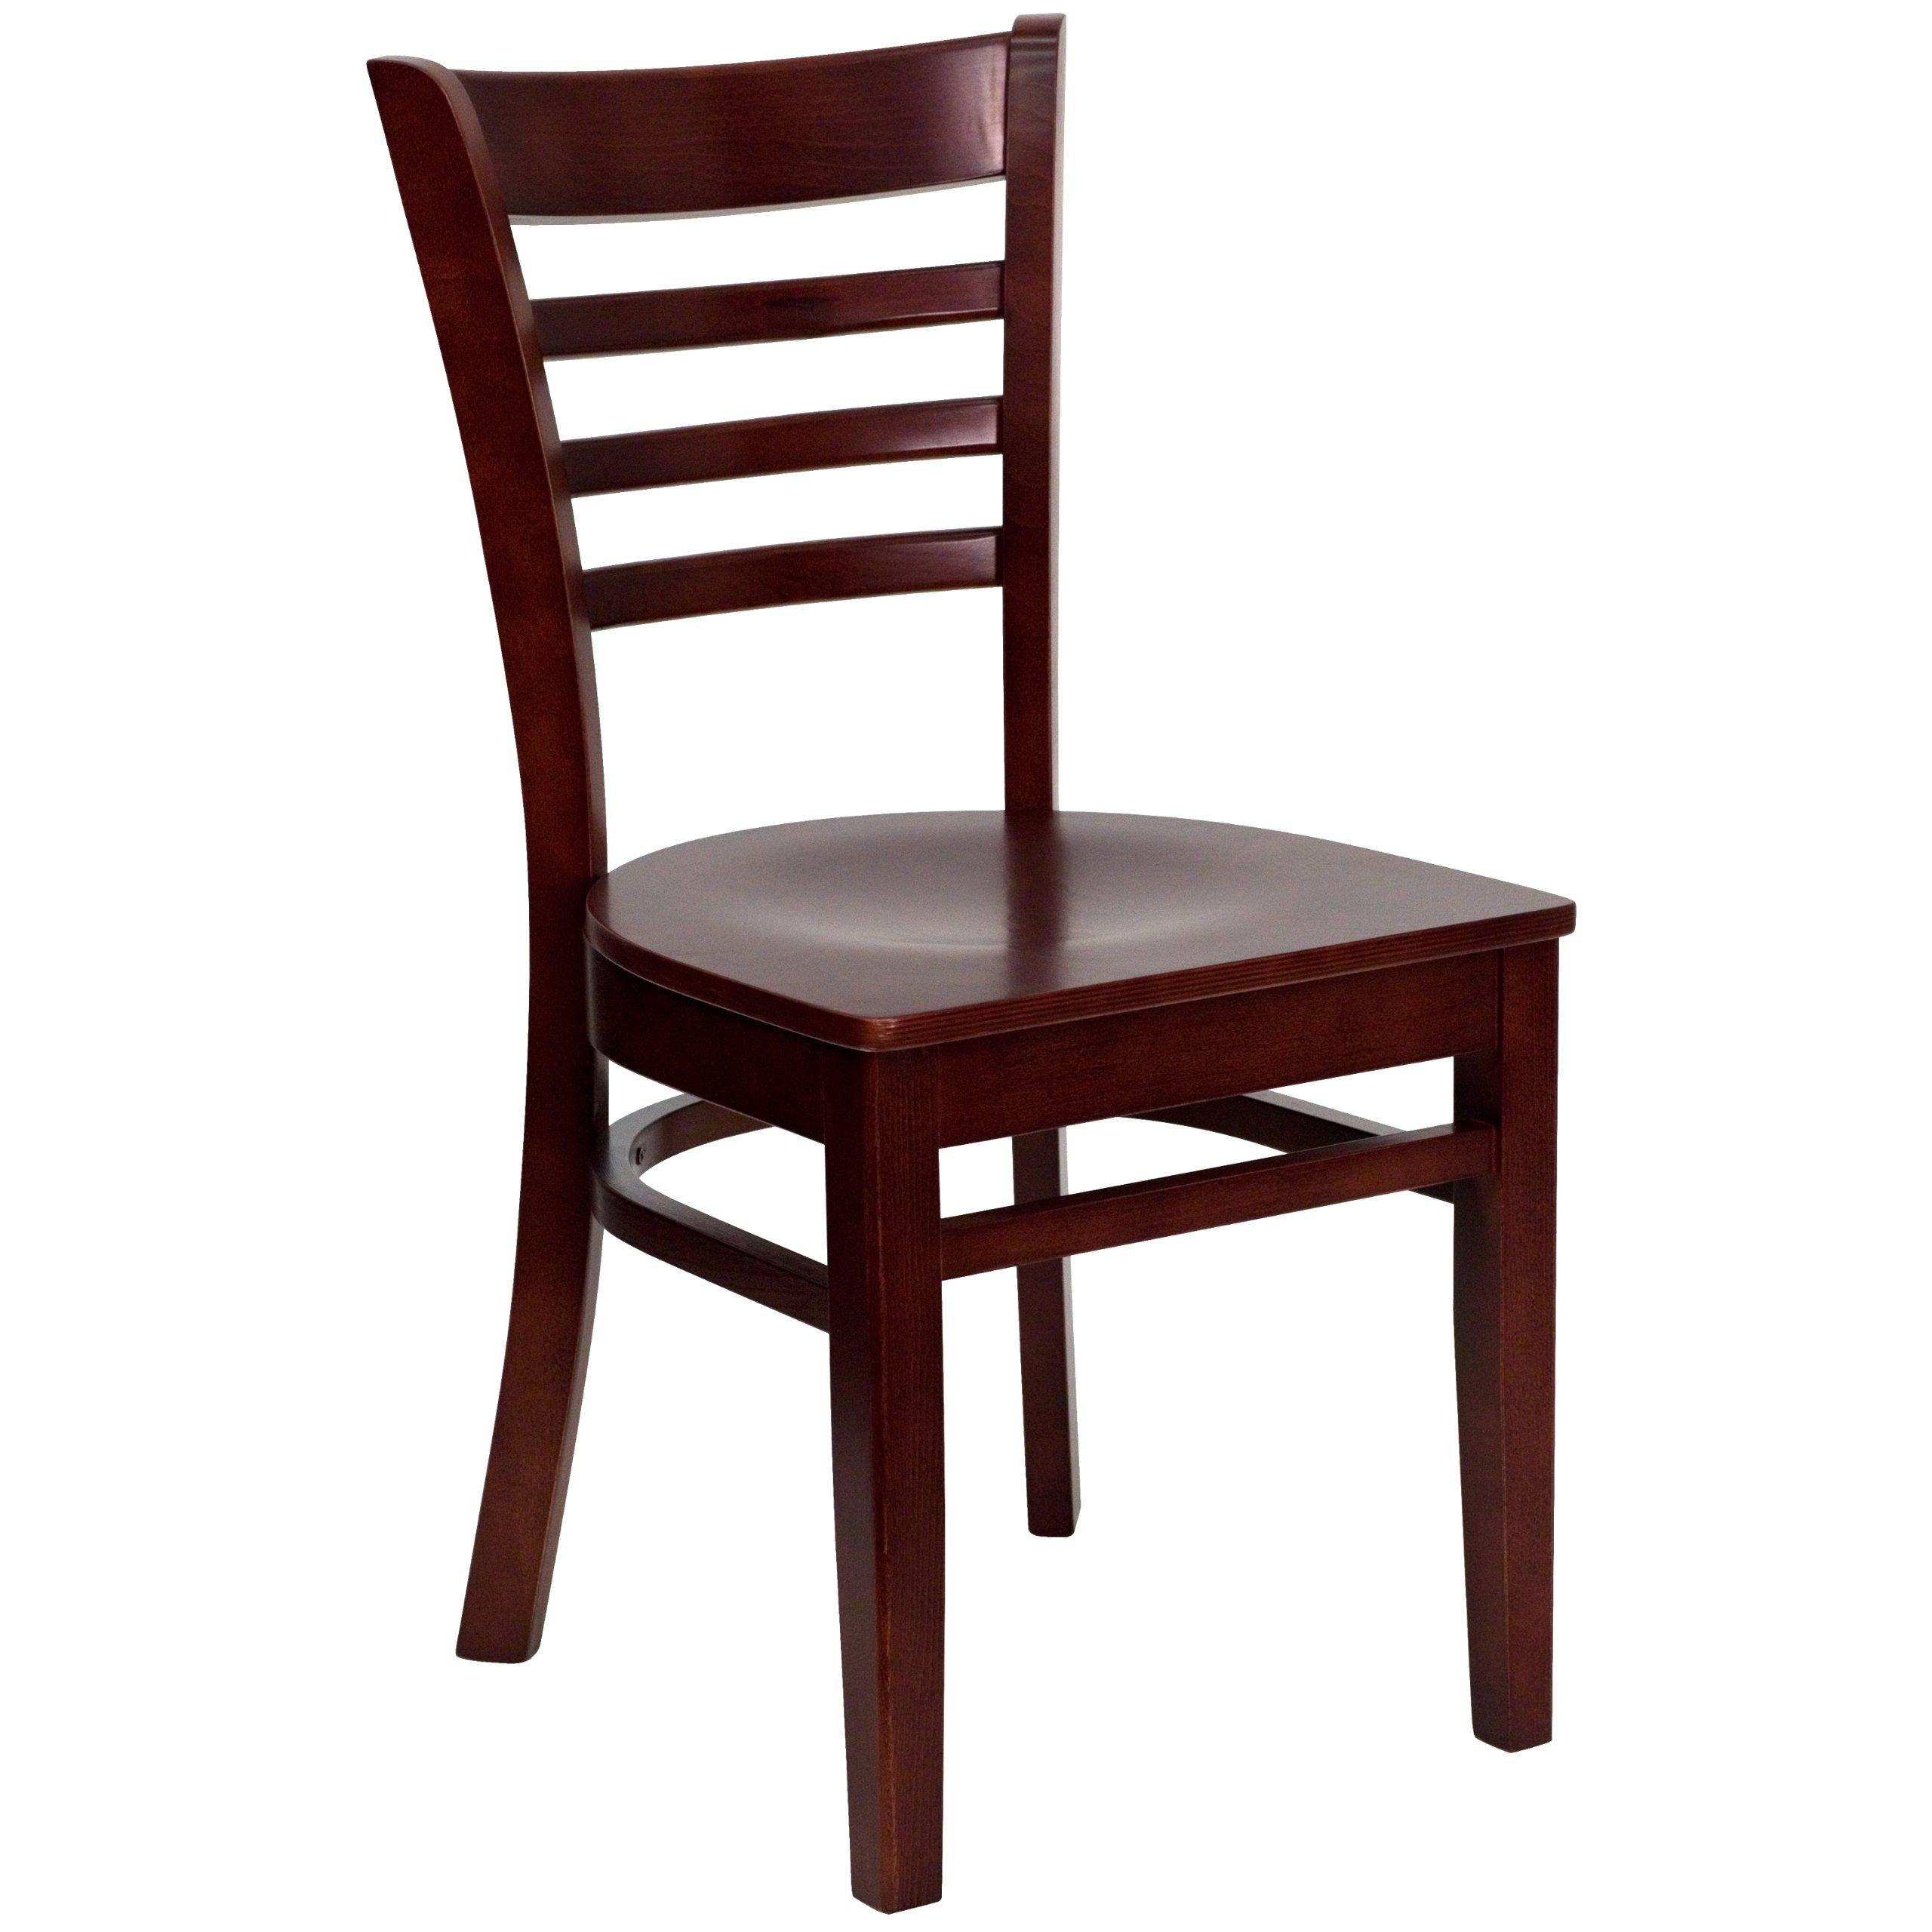 Flash Furniture HERCULES Series Ladder Back Mahogany Wood Restaurant Chair by Flash Furniture (Image #1)